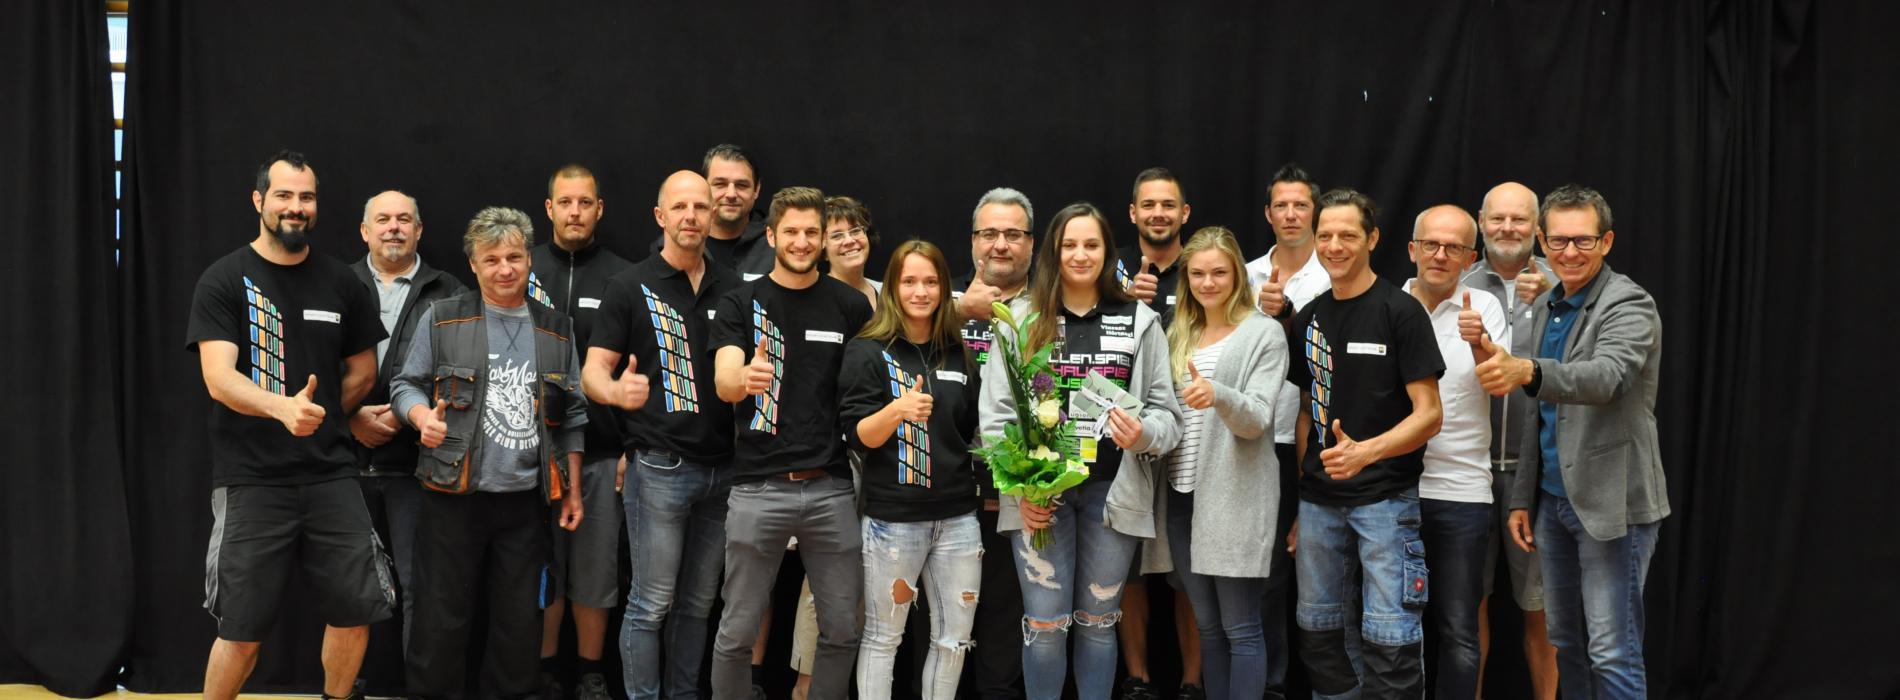 Sarah Fischer ist Vize-Europameisterin